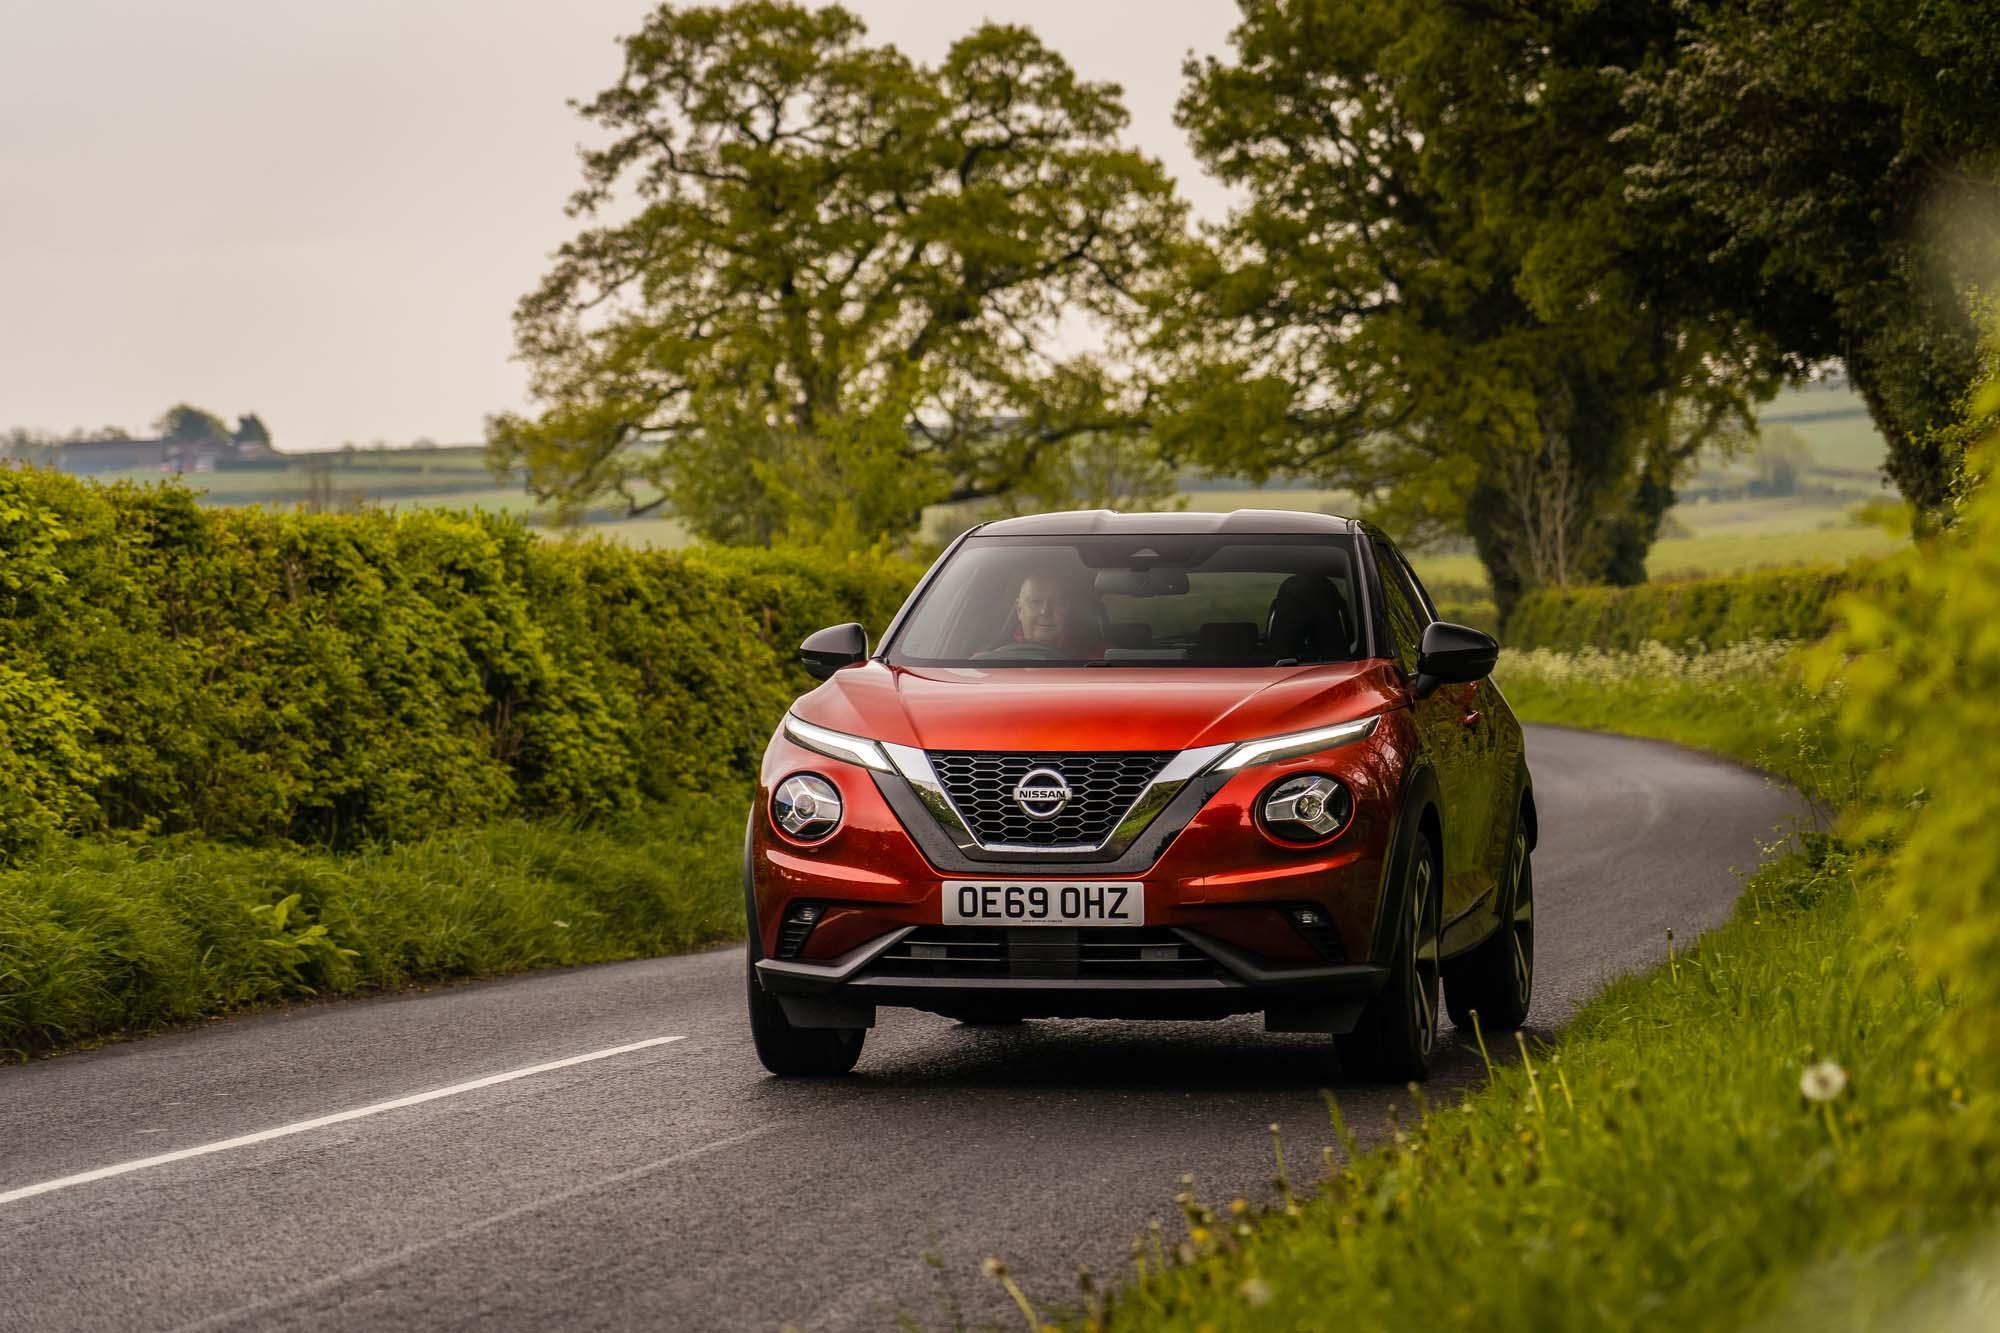 JUKE Driving Masterclass 6 Ο κορυφαίος εκπαιδευτής οδήγησης της Nissan, προσφέρει masterclass οδήγησης με το JUKE Nissan, Nissan Juke, zblog, ειδήσεις, Νέα